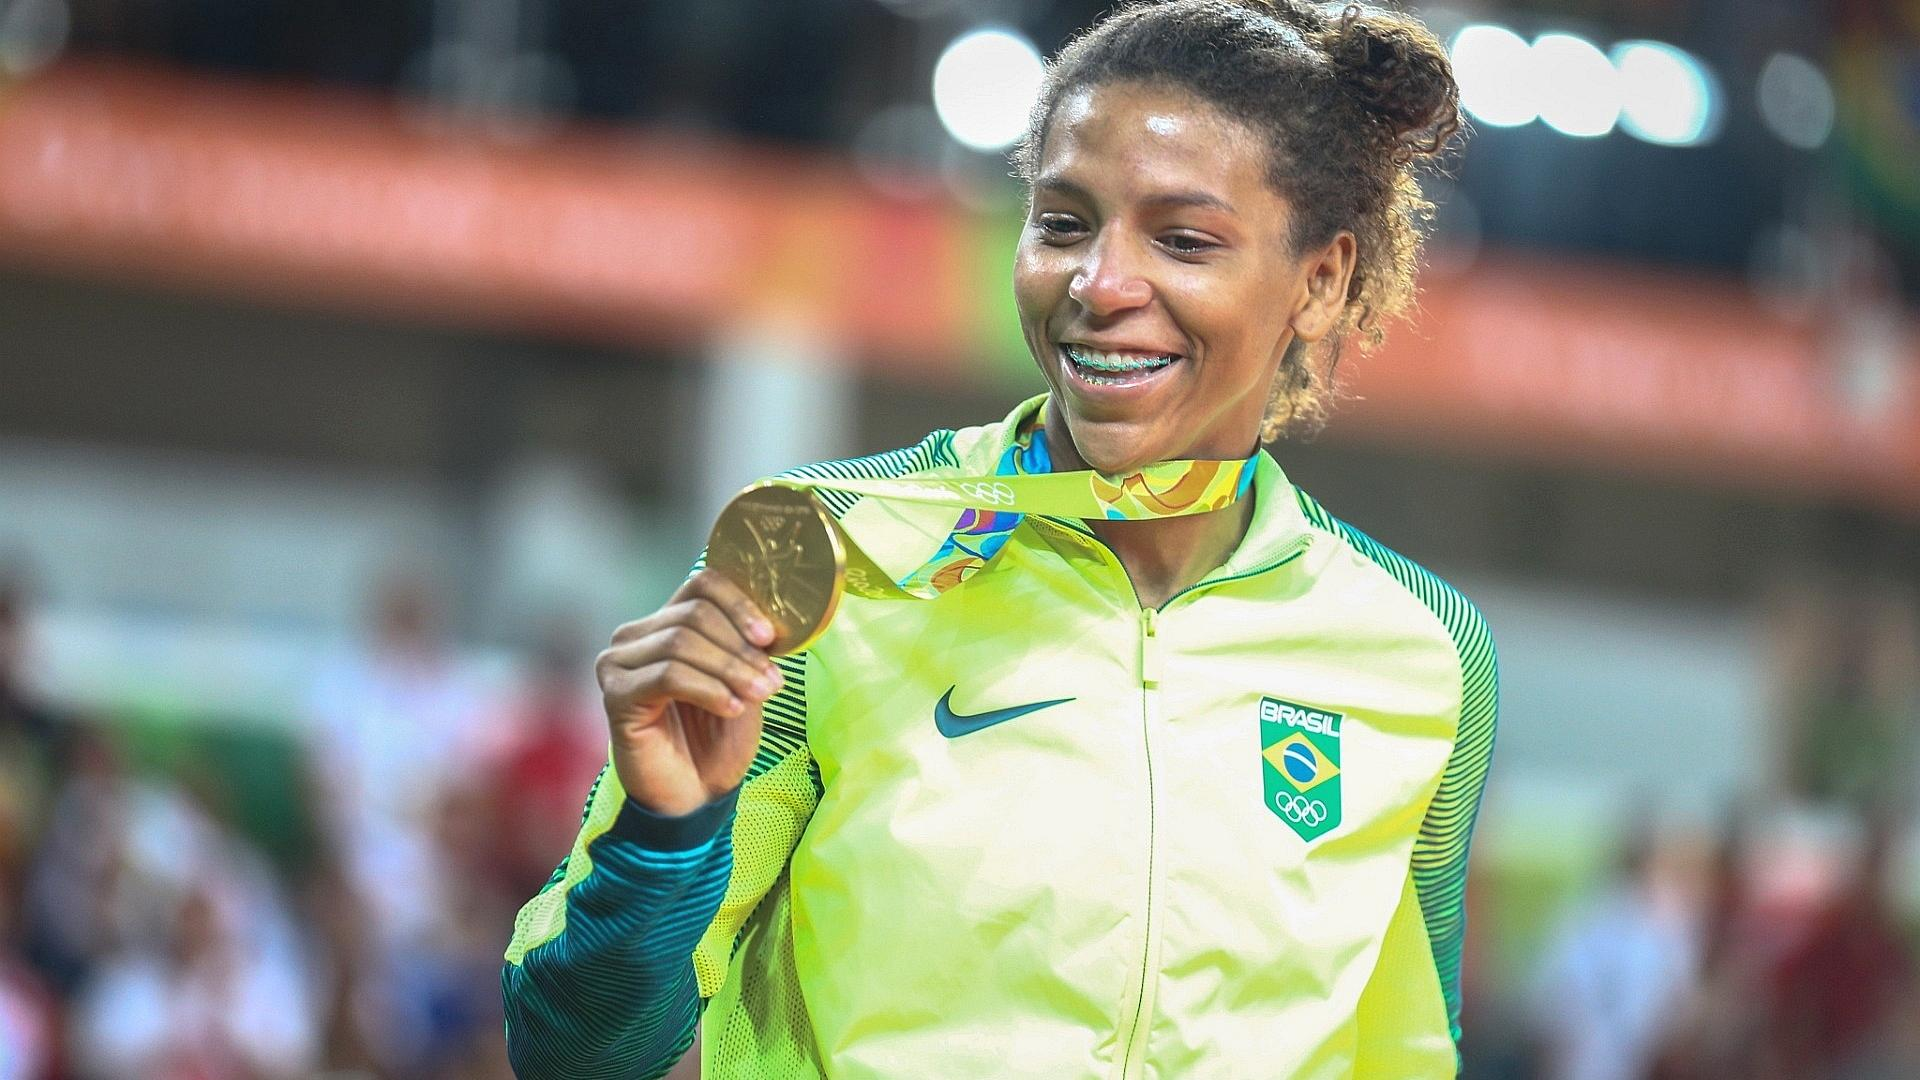 Rafaela Silva - Atletas femininas das Olimpíadas 2016